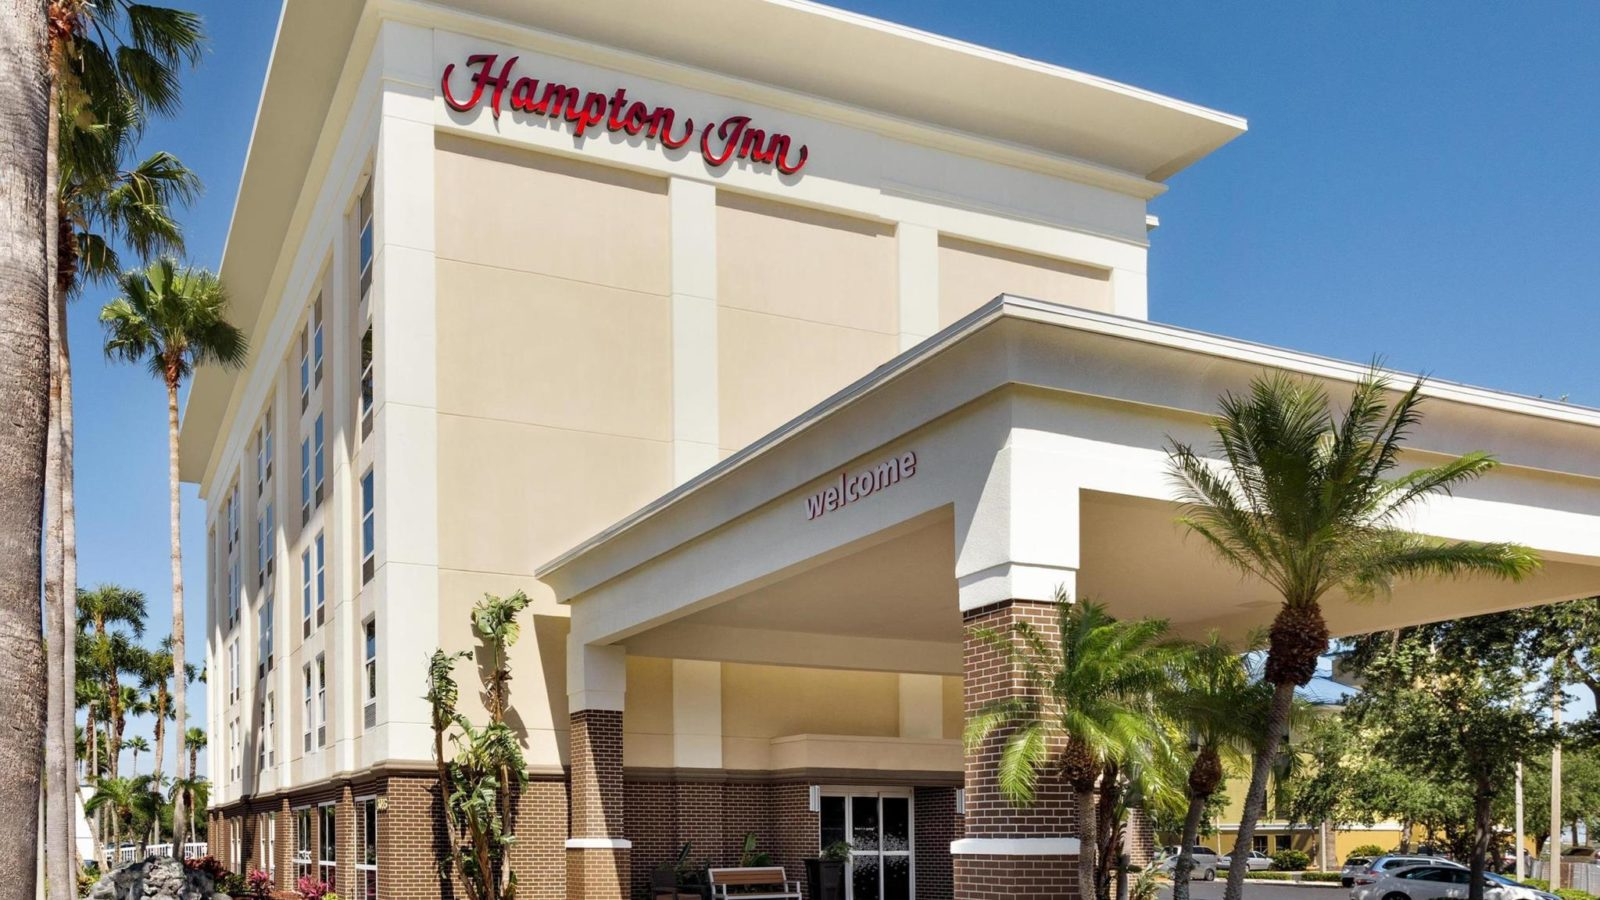 Hampton Inn Tampa Rocky Point exterior